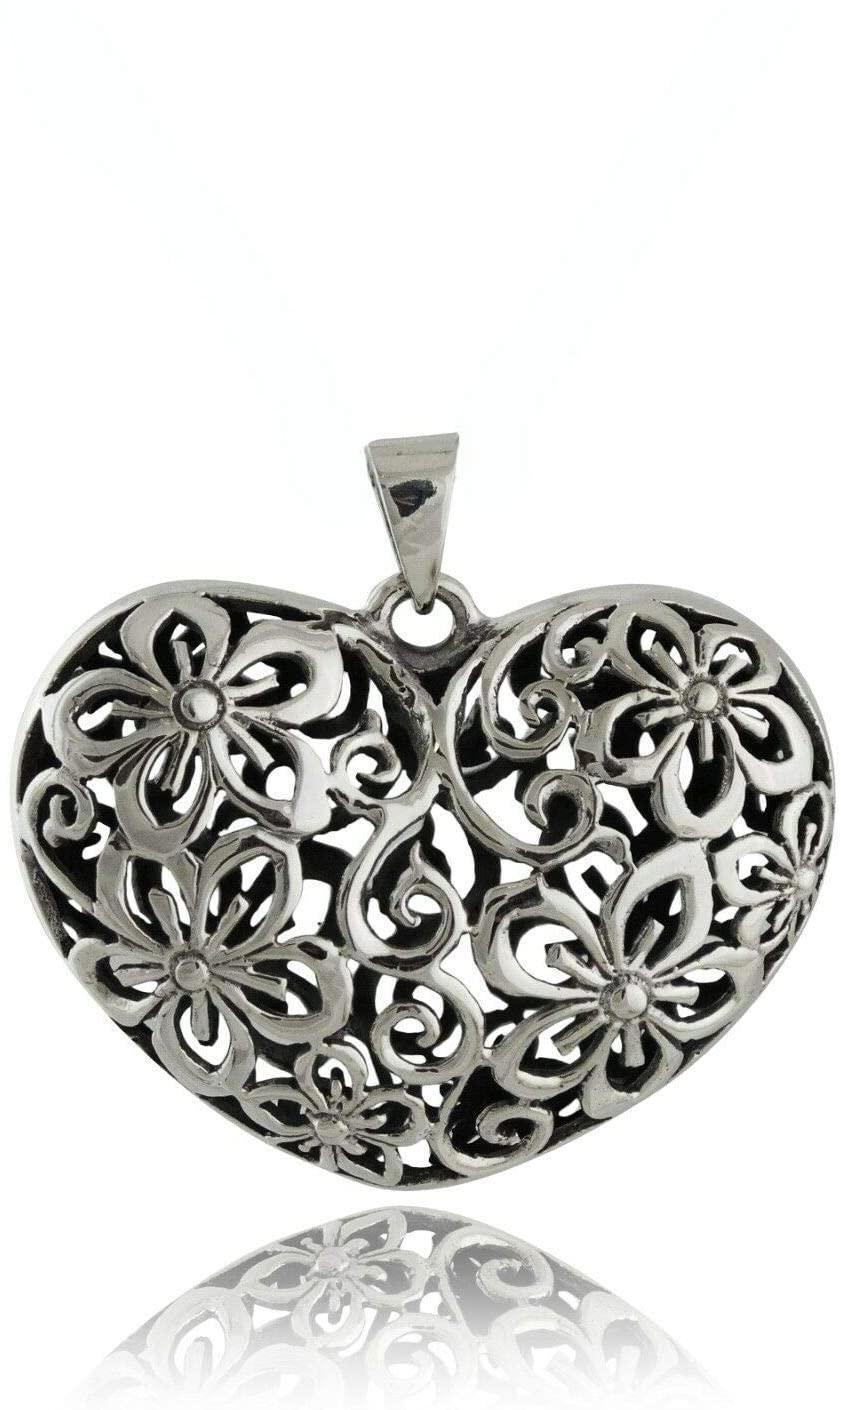 Charm Pendant - Jewelry Making DIY - Bracelet Filigree Heart - 925 Sterling Silver - Flower 3D Open Love Gift